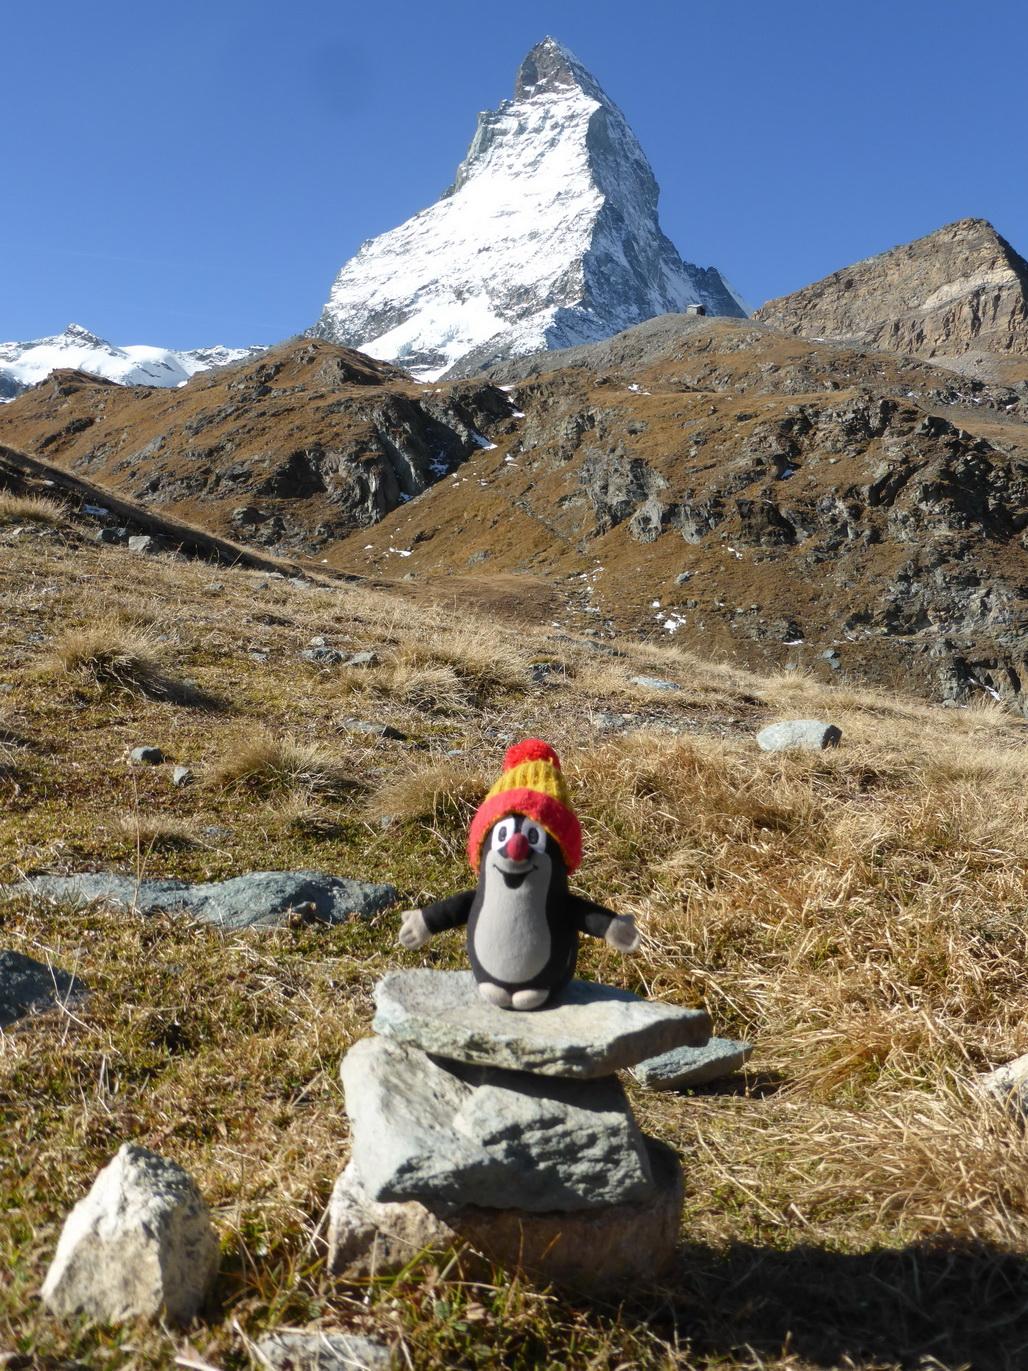 _Krtek_pod_Matterhornom_(jeseň_2014)